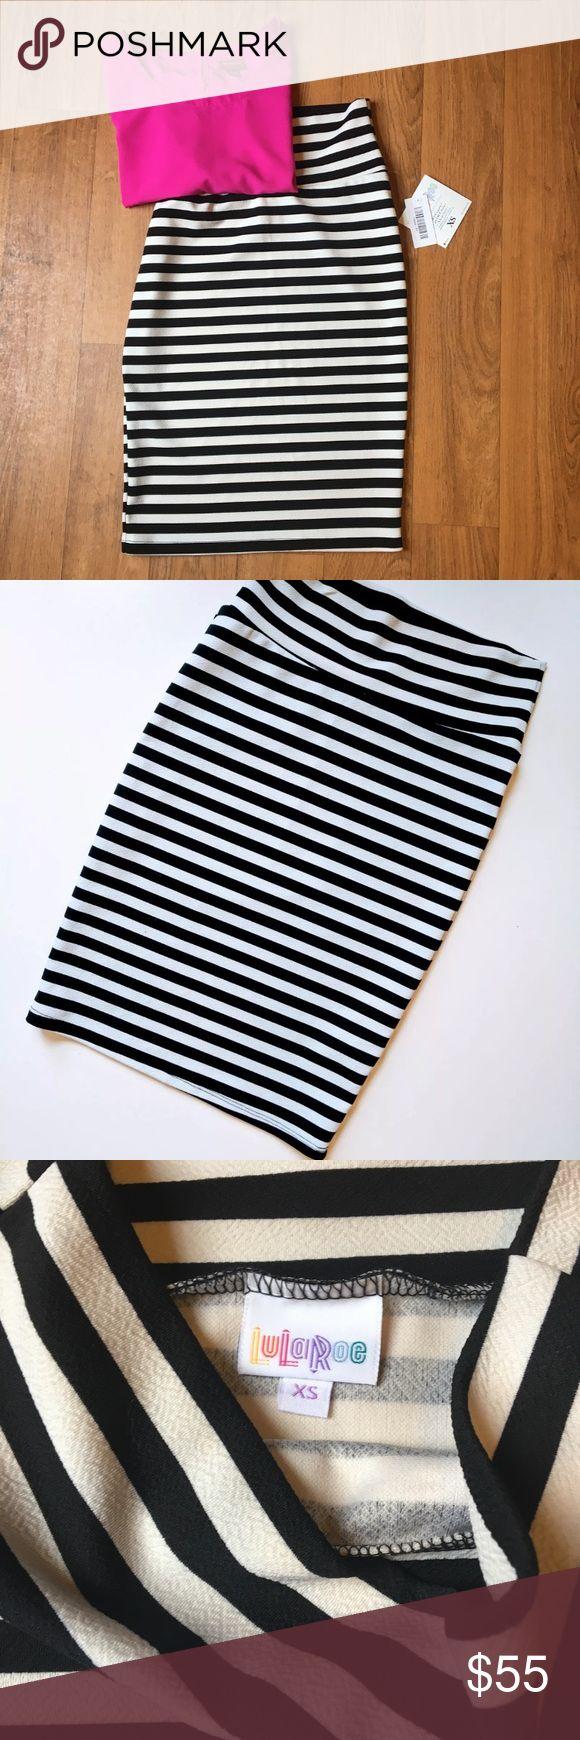 NWT Striped Lularoe Cassie Skirt Black and white striped Lularoe Cassie skirt. Skirt only. LuLaRoe Skirts